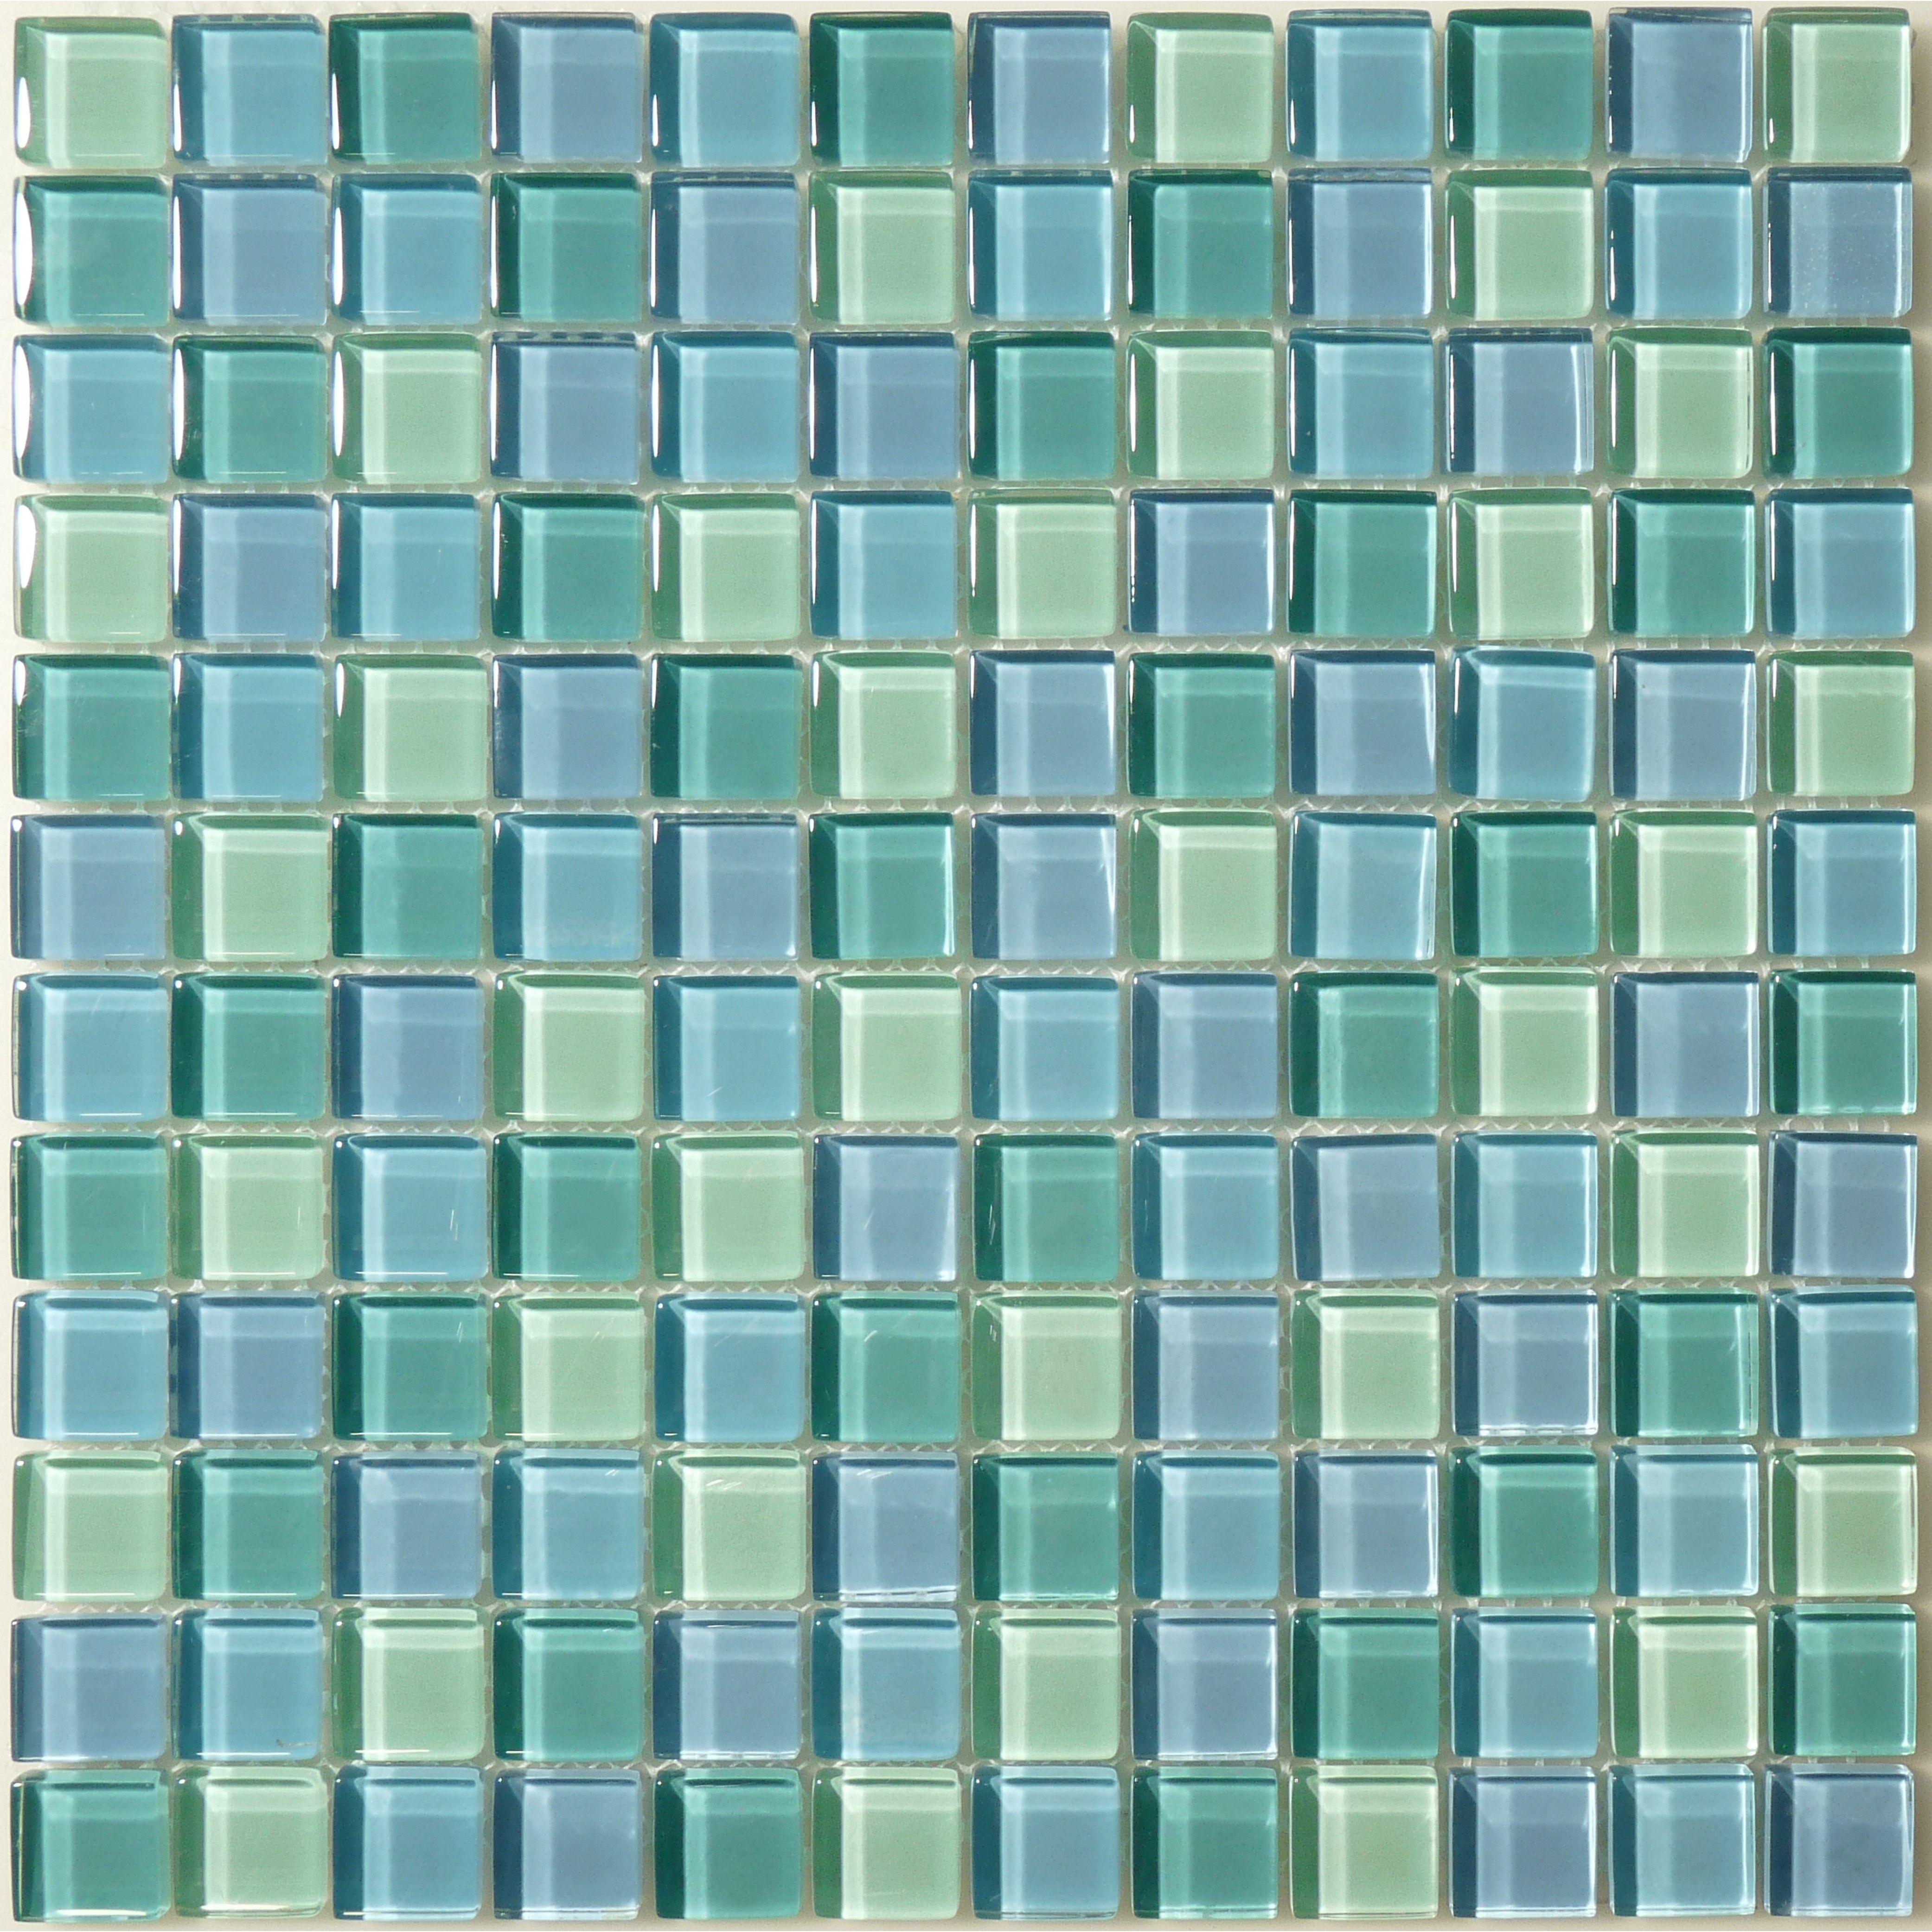 Gc82323t1 Turquoise Blue Blend 1 Sea Glass Tile Mosaic Pool Mosaic Pool Tile